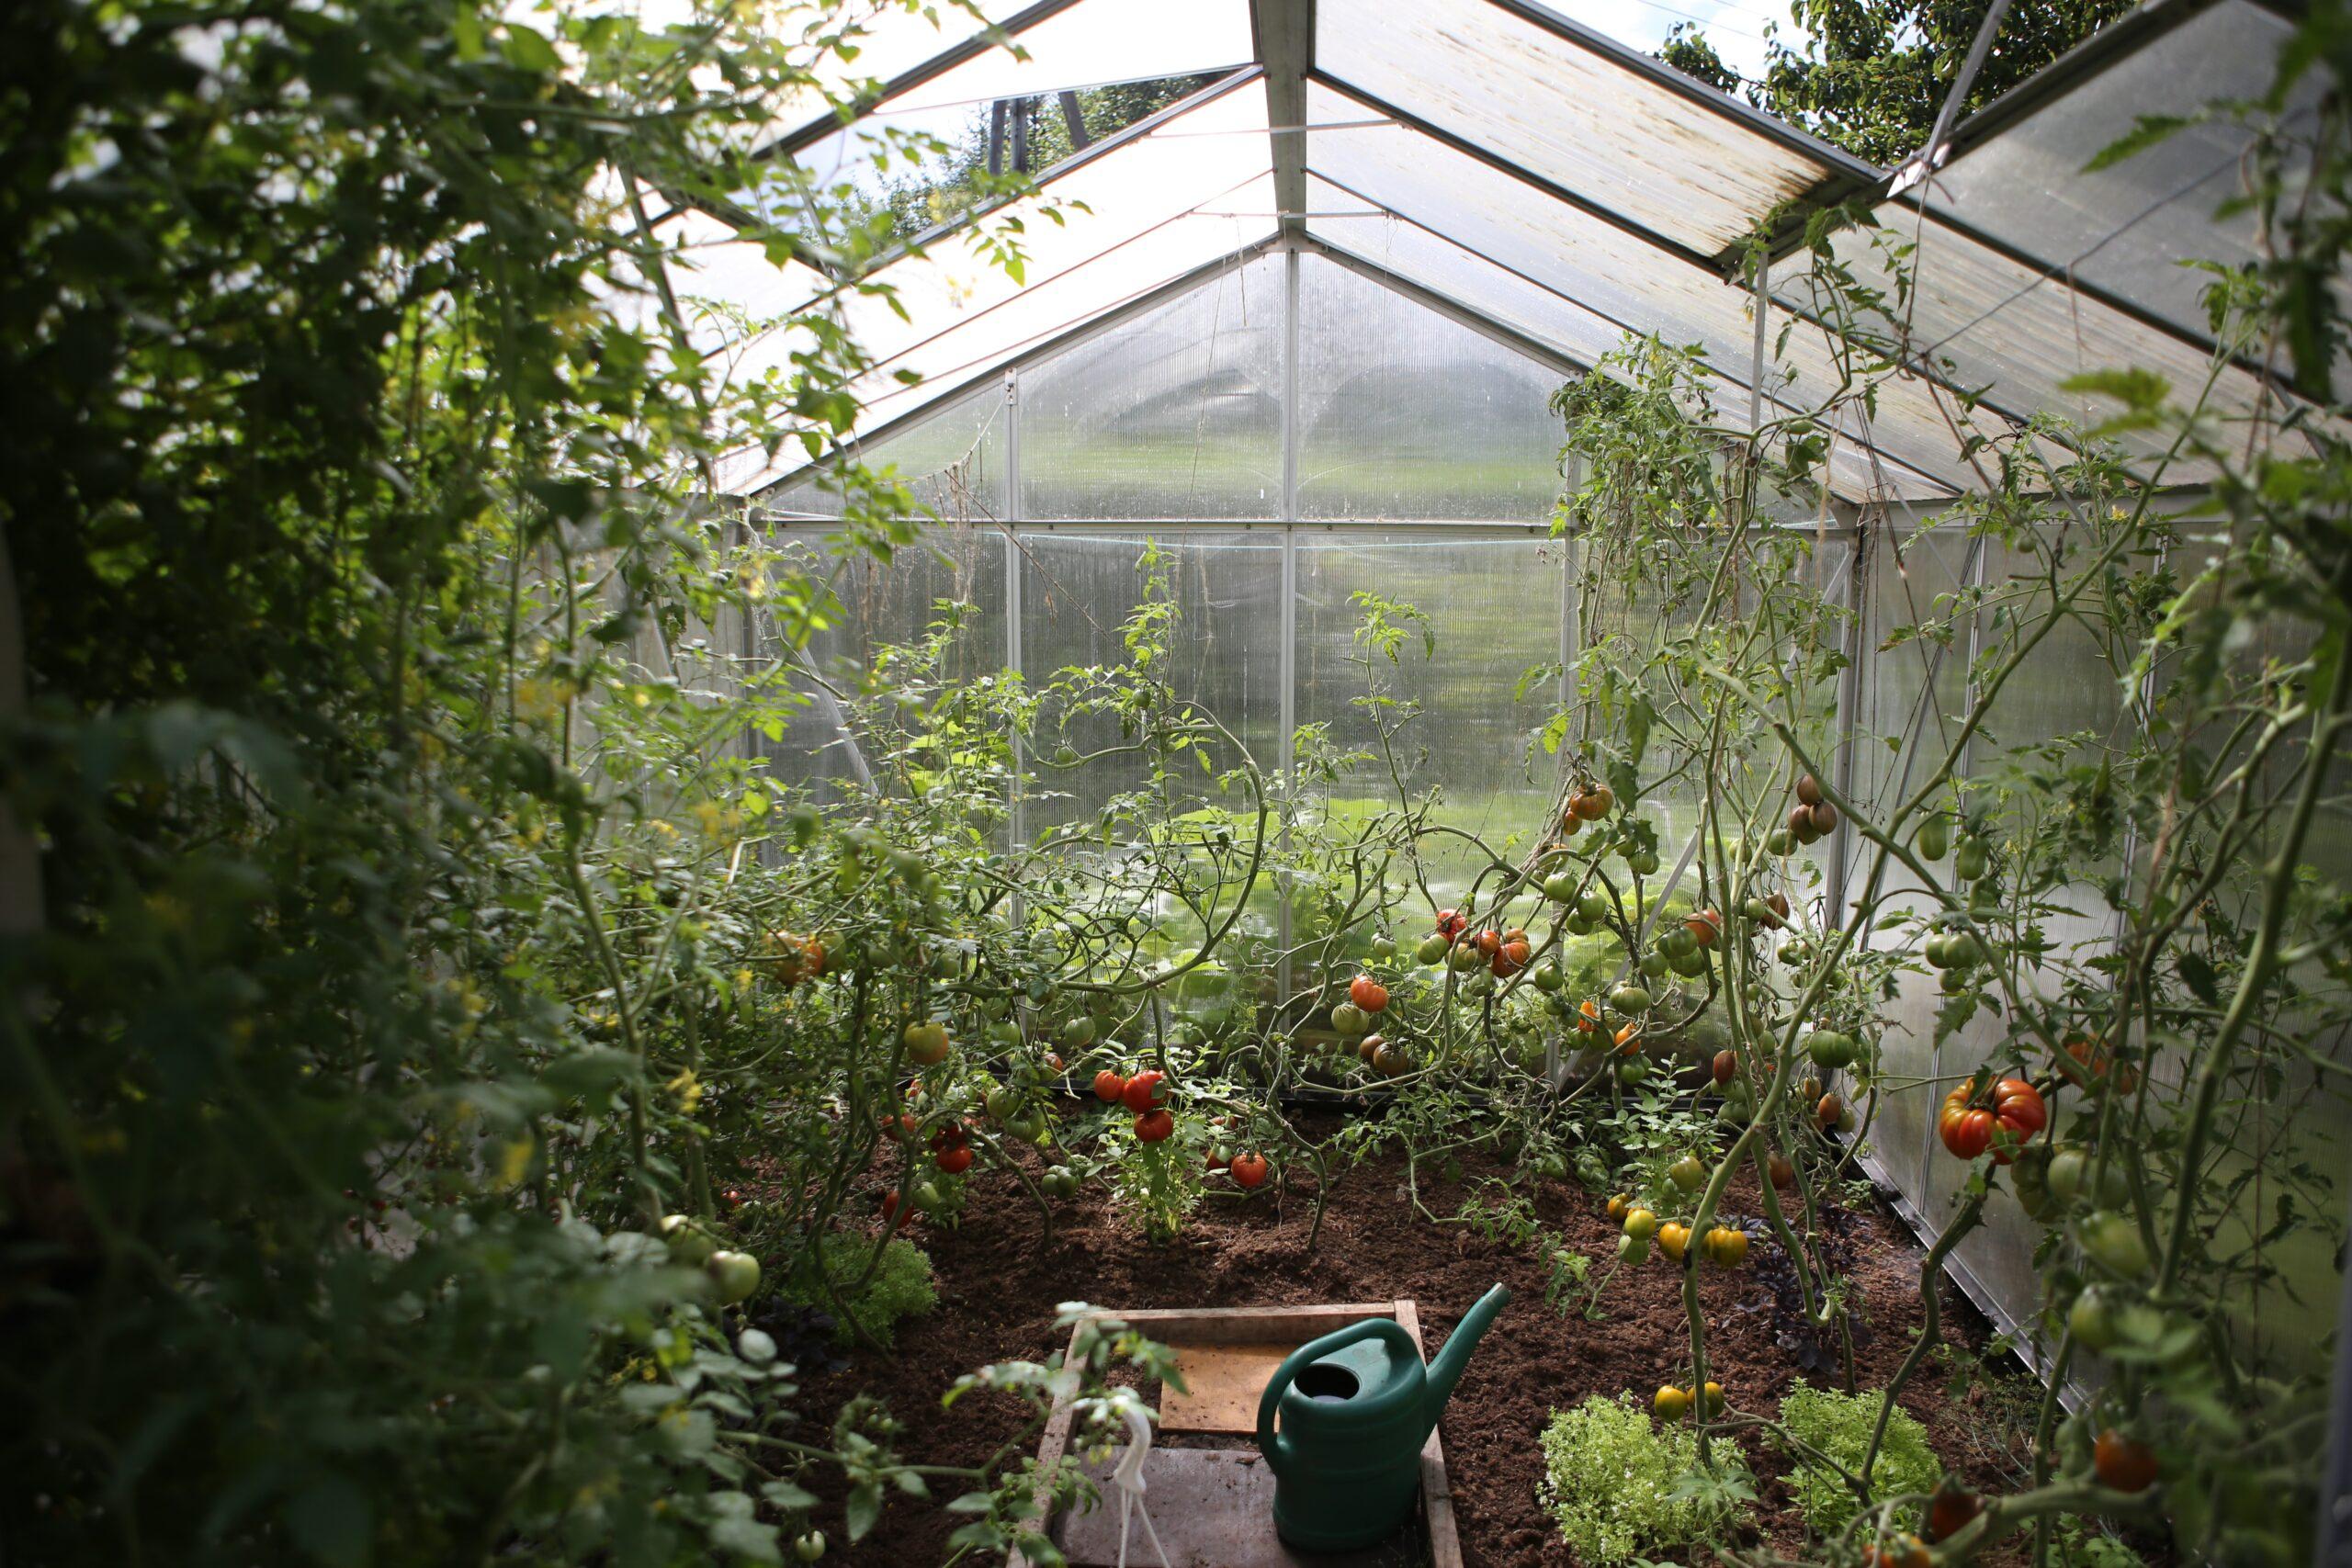 Kolonilottens studiecirkel: Växthus